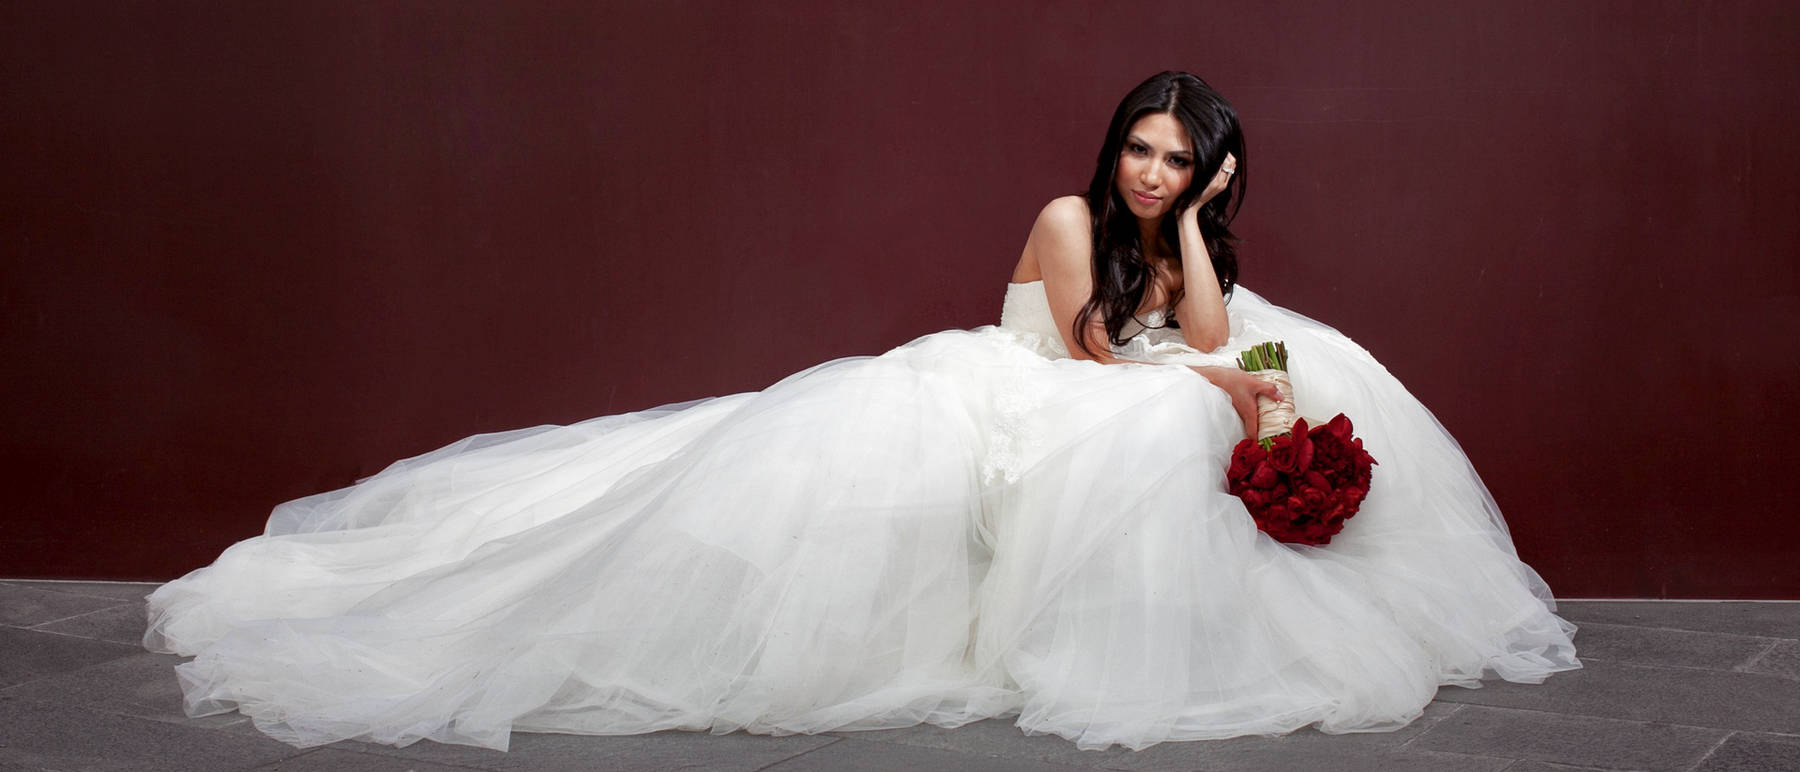 johnandjoseph-wedding-photographer-hz-slider-239